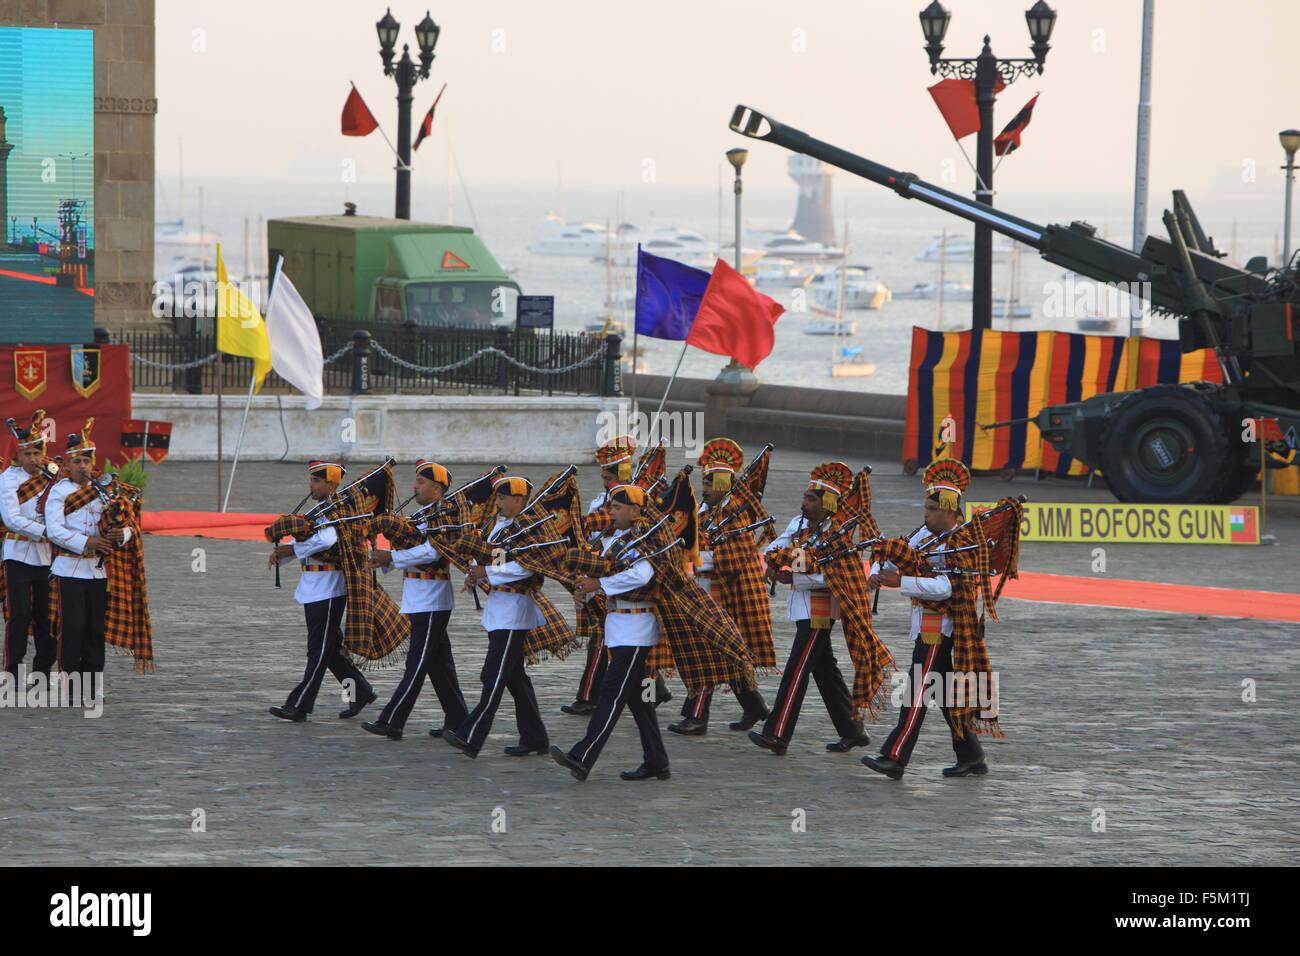 Dogra regiment bag pipers plying, gateway, mumbai, maharashtra, india, asia - Stock Image